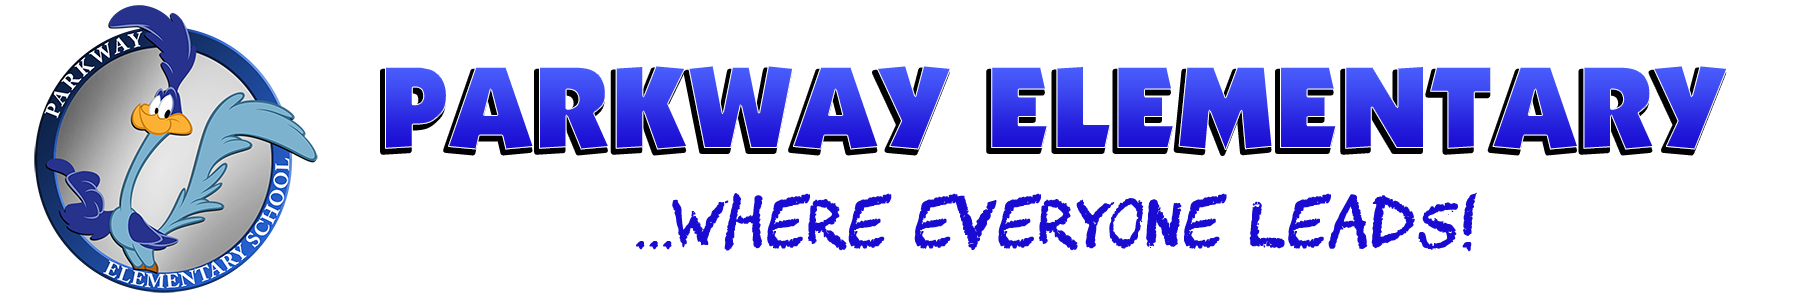 Parkway Elementary